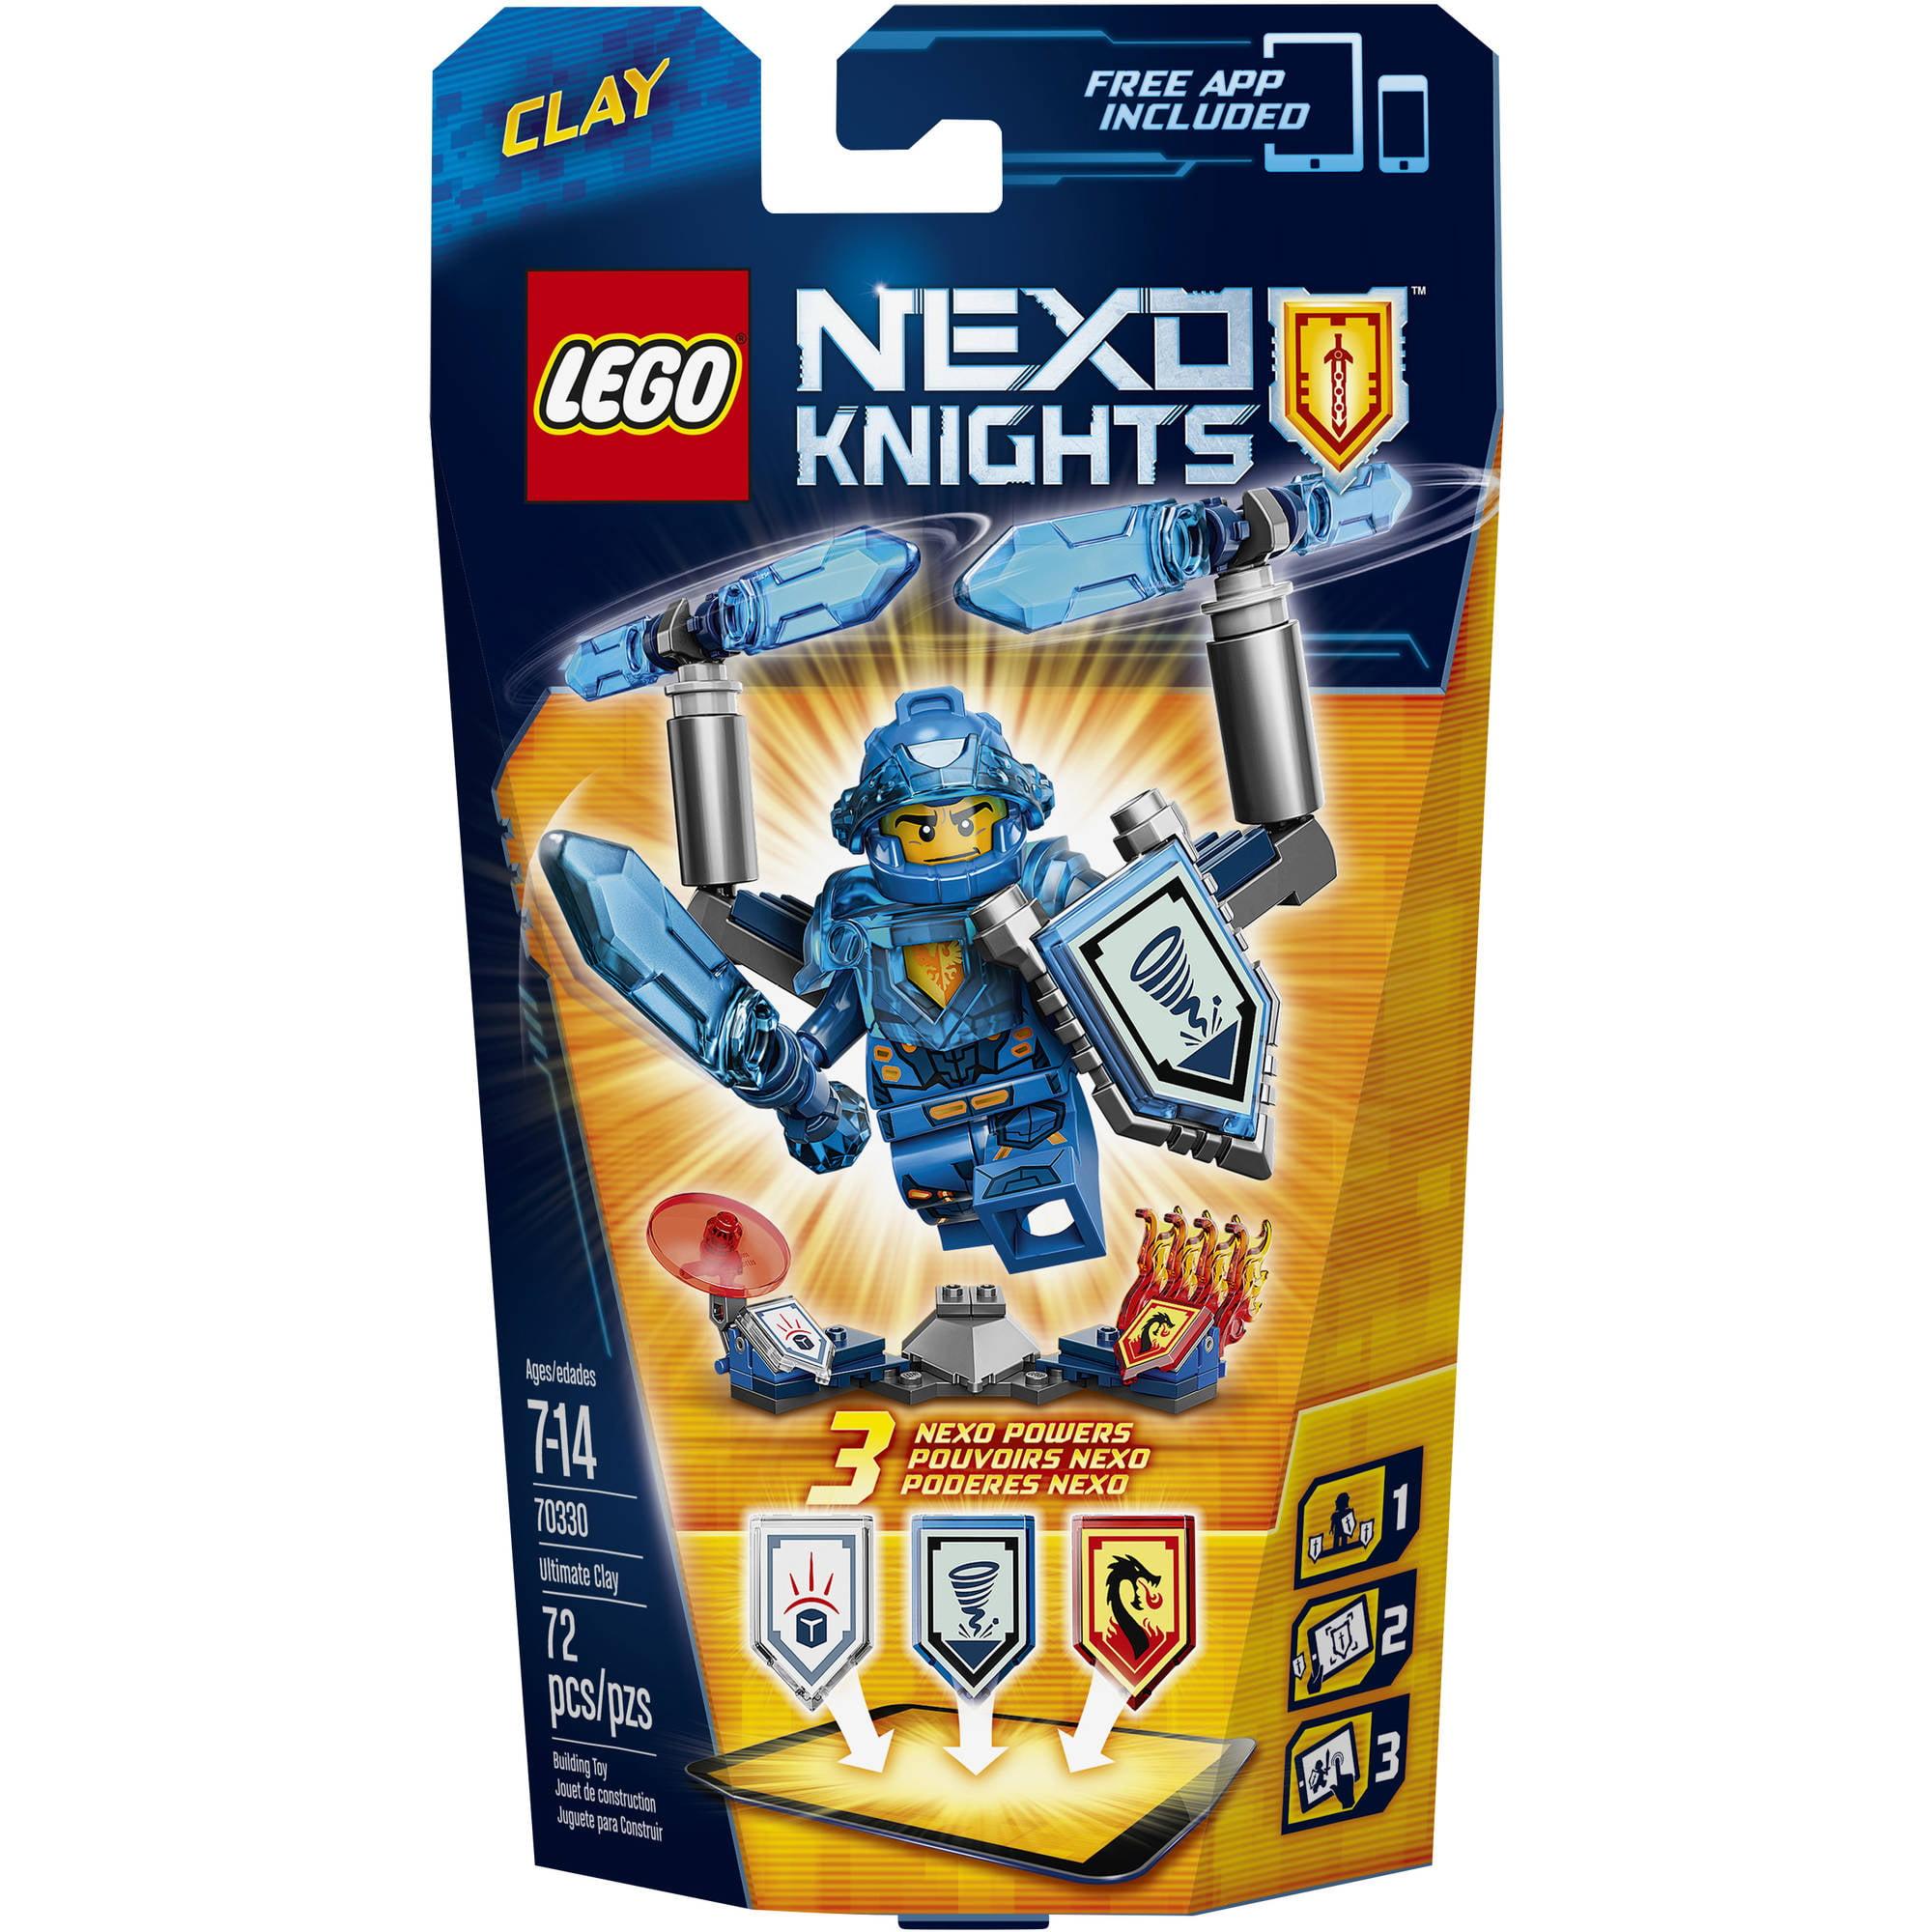 ULTIMATE Clay  Mixed LEGO Nexo Knights 70330